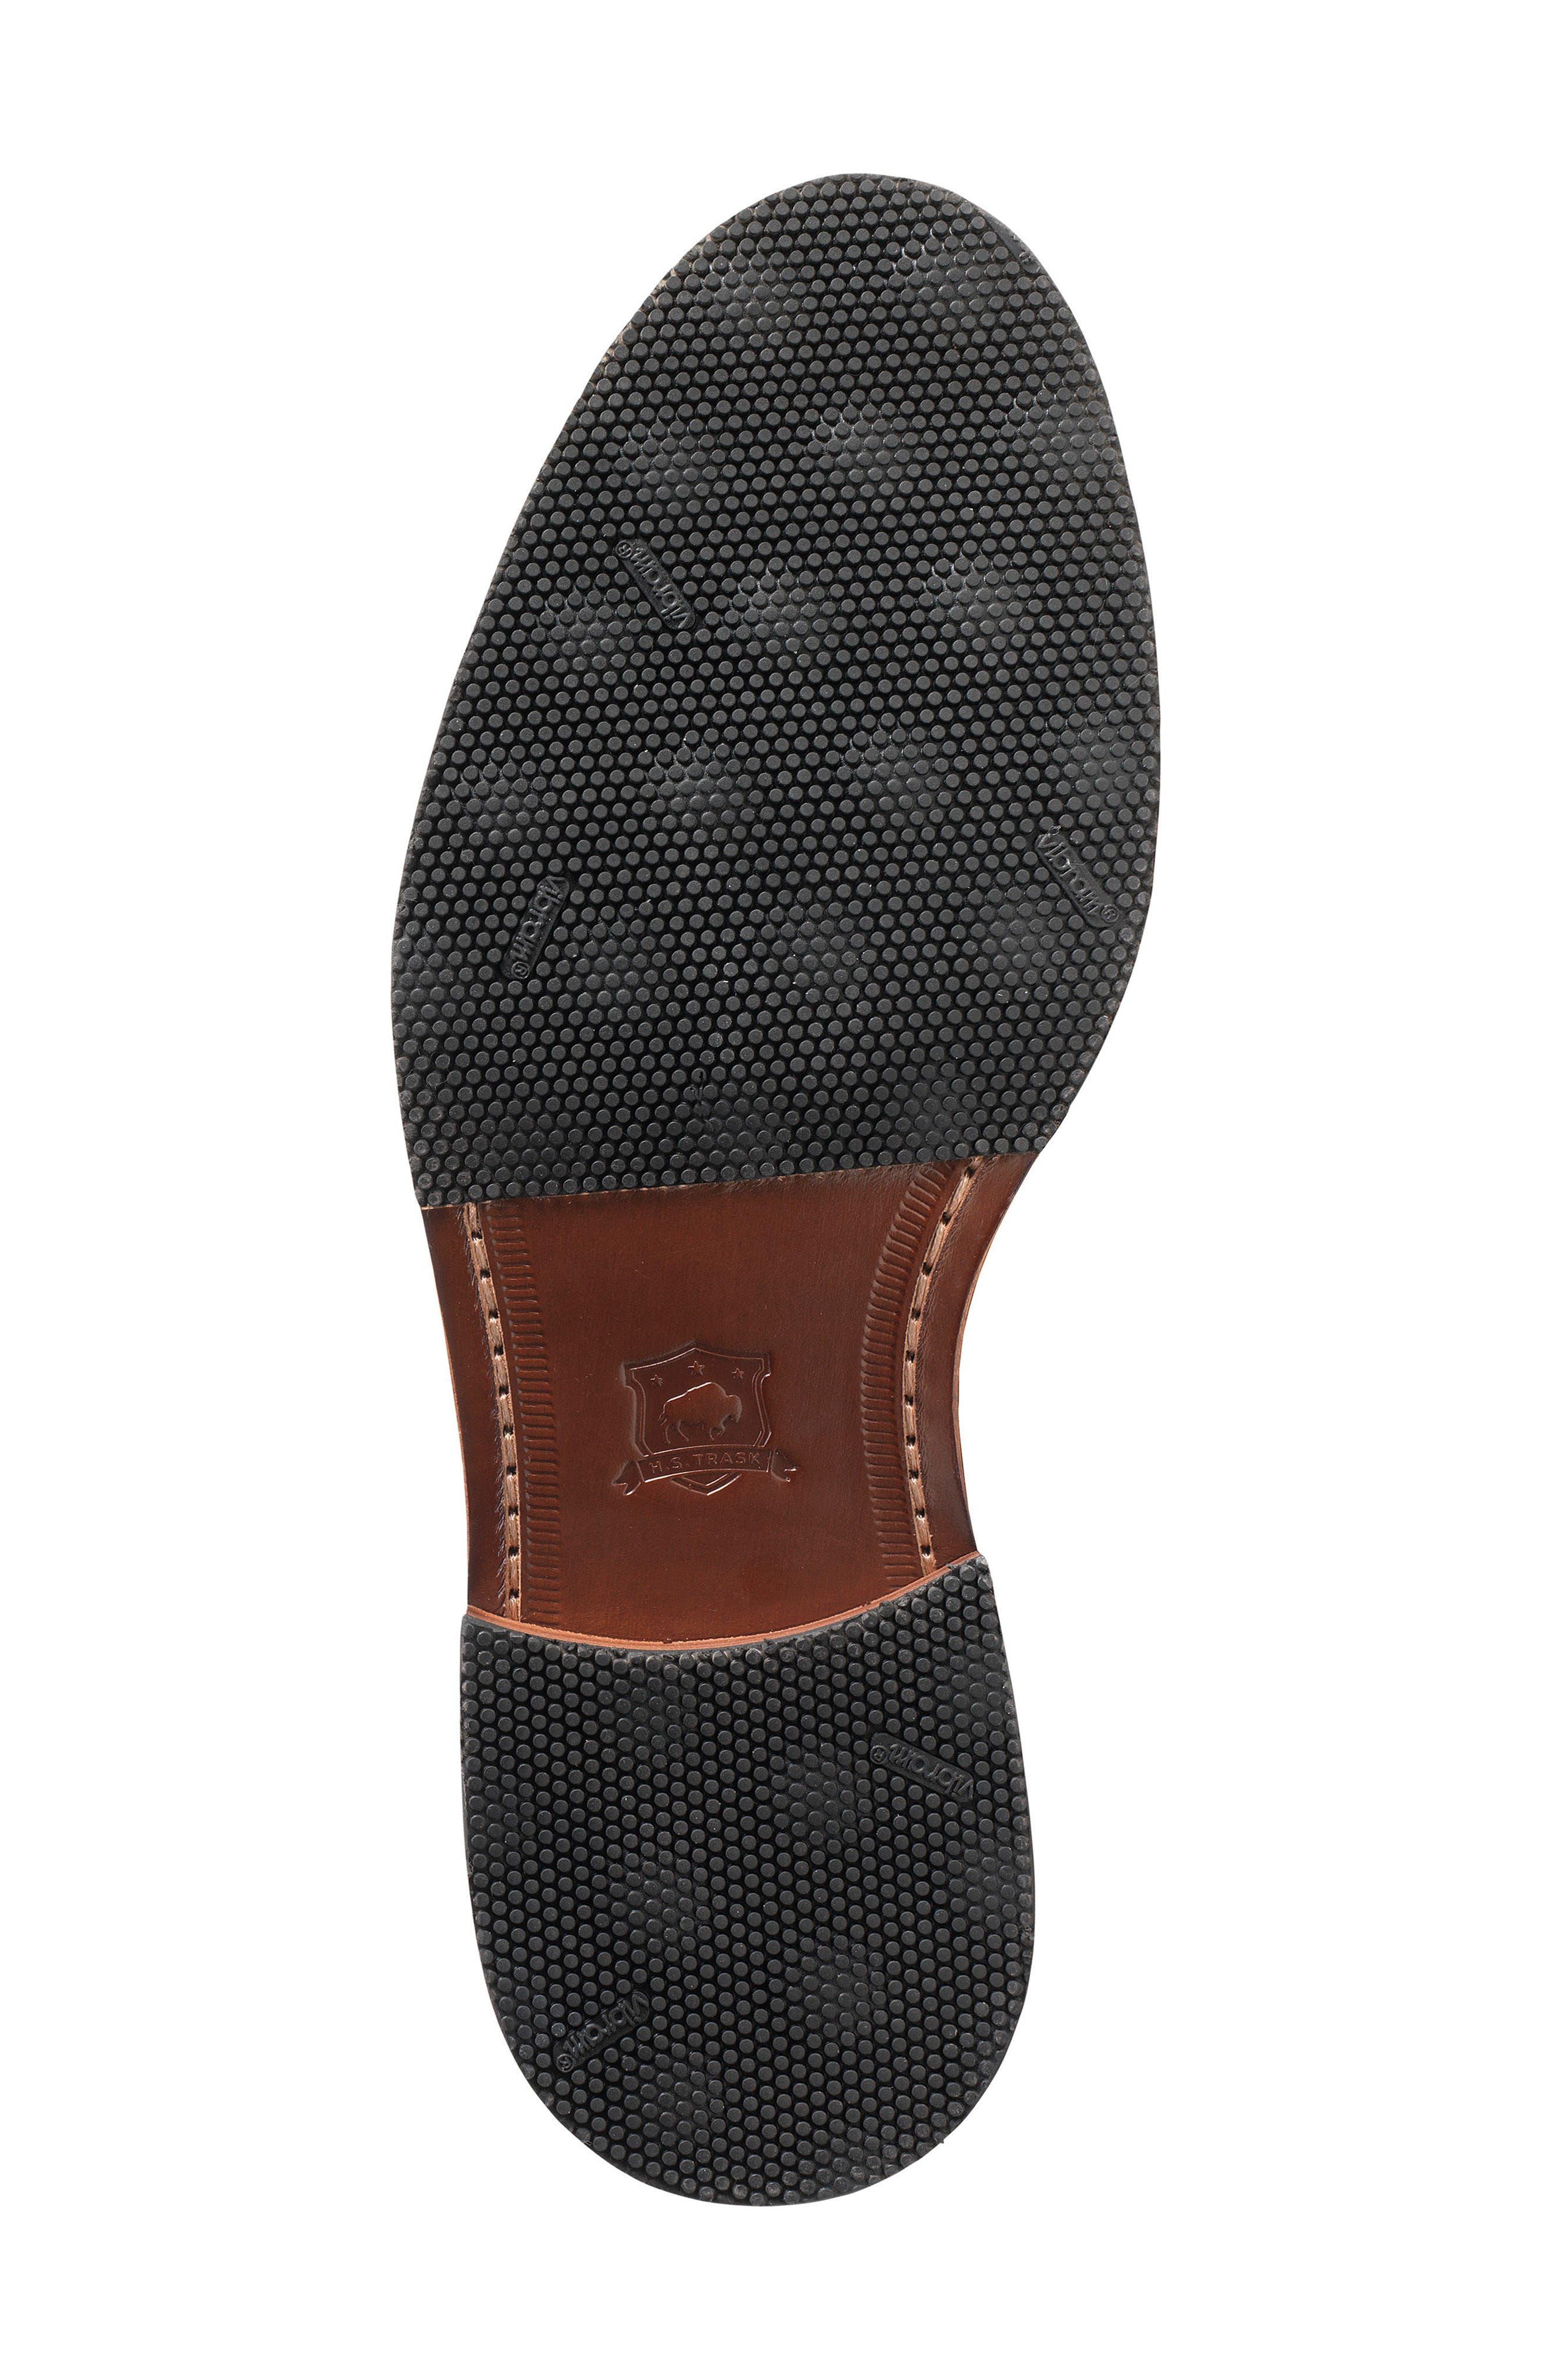 Leland Double Monk Strap Shoe,                             Alternate thumbnail 4, color,                             Navy Waxed Suede